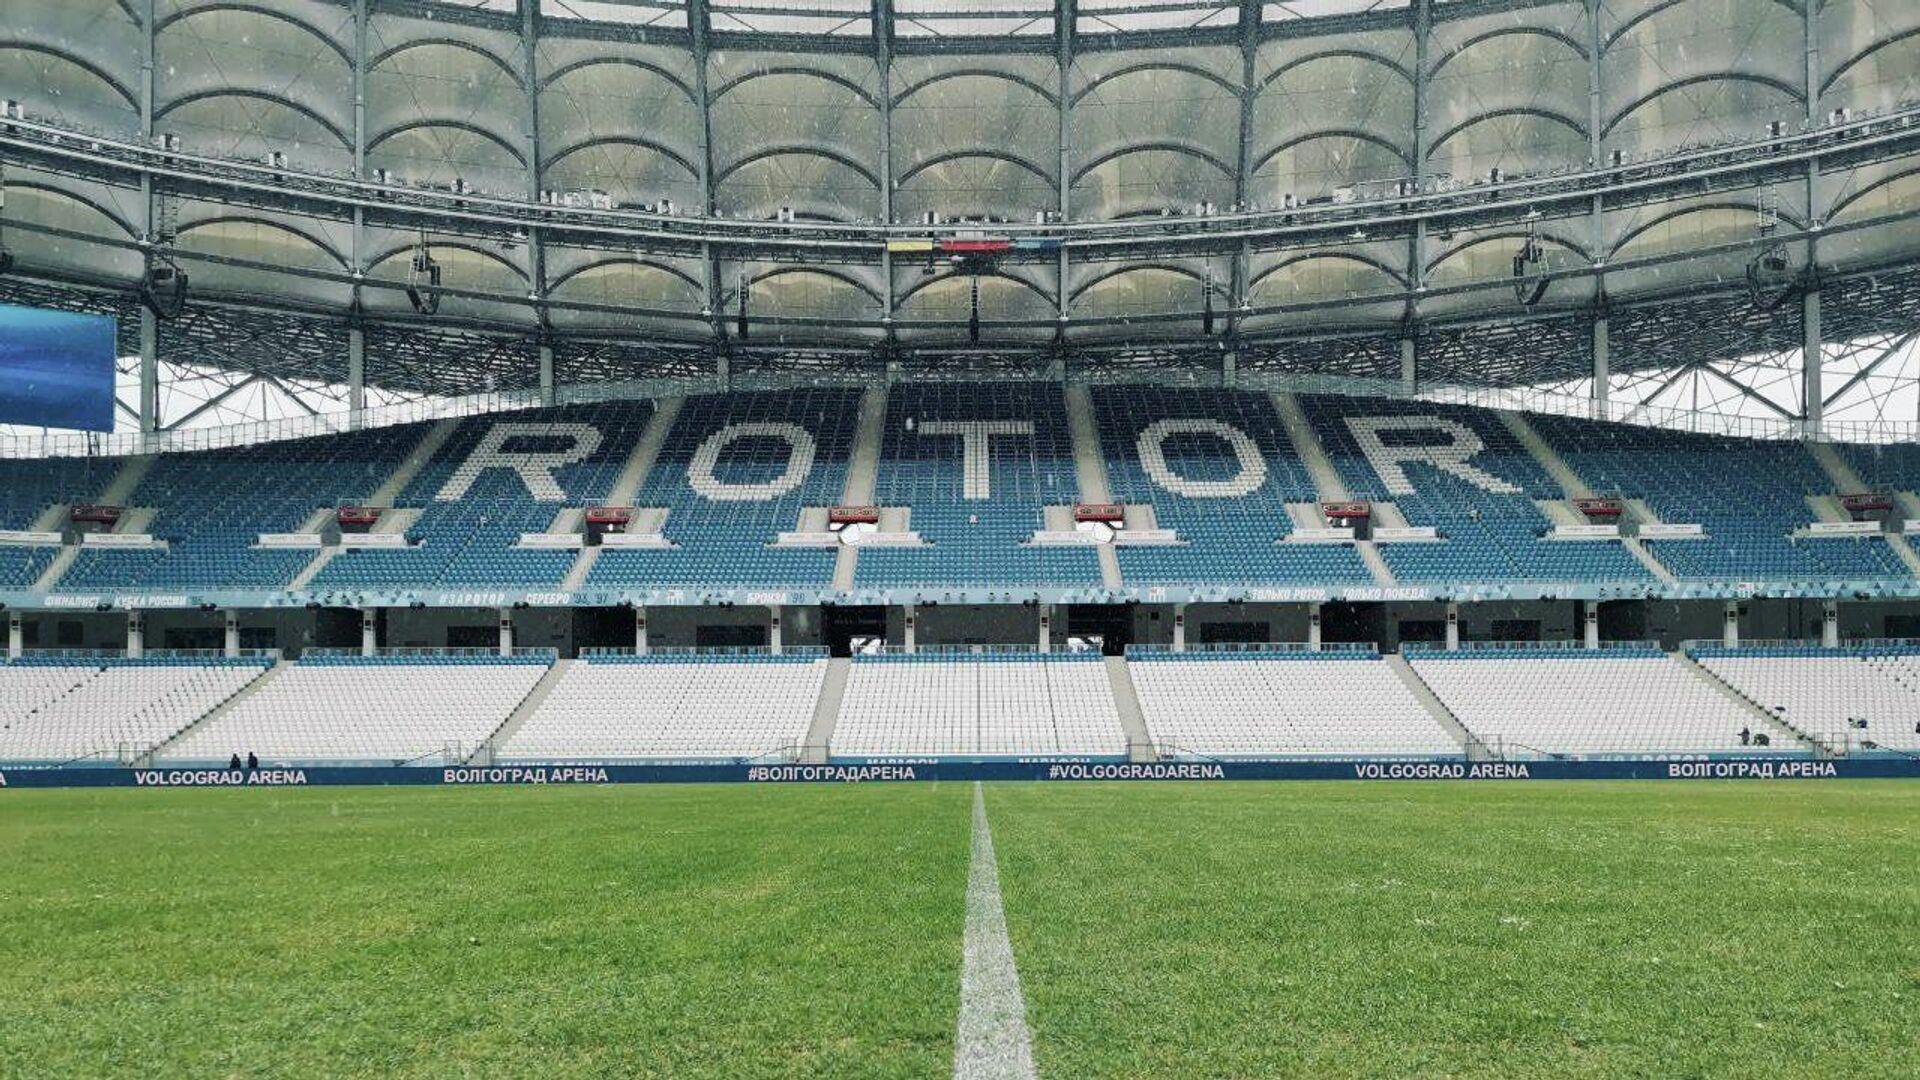 Домашний стадион Ротора Волгоград Арена - РИА Новости, 1920, 07.03.2021